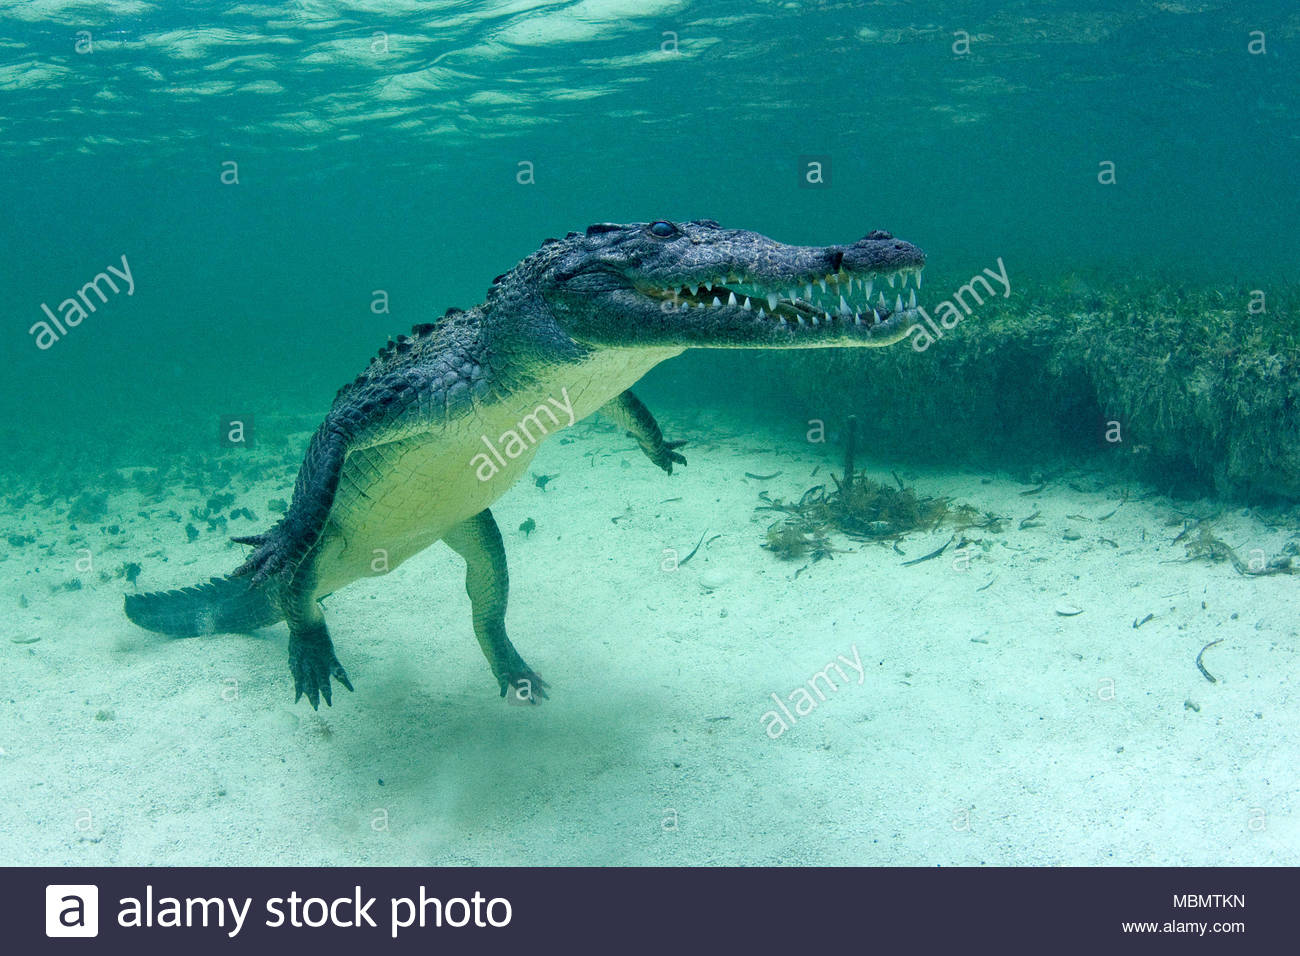 American crocodile (Crocodylus acutus), Banco Chinchorro, Quintana Roo, Mexico - Stock Image